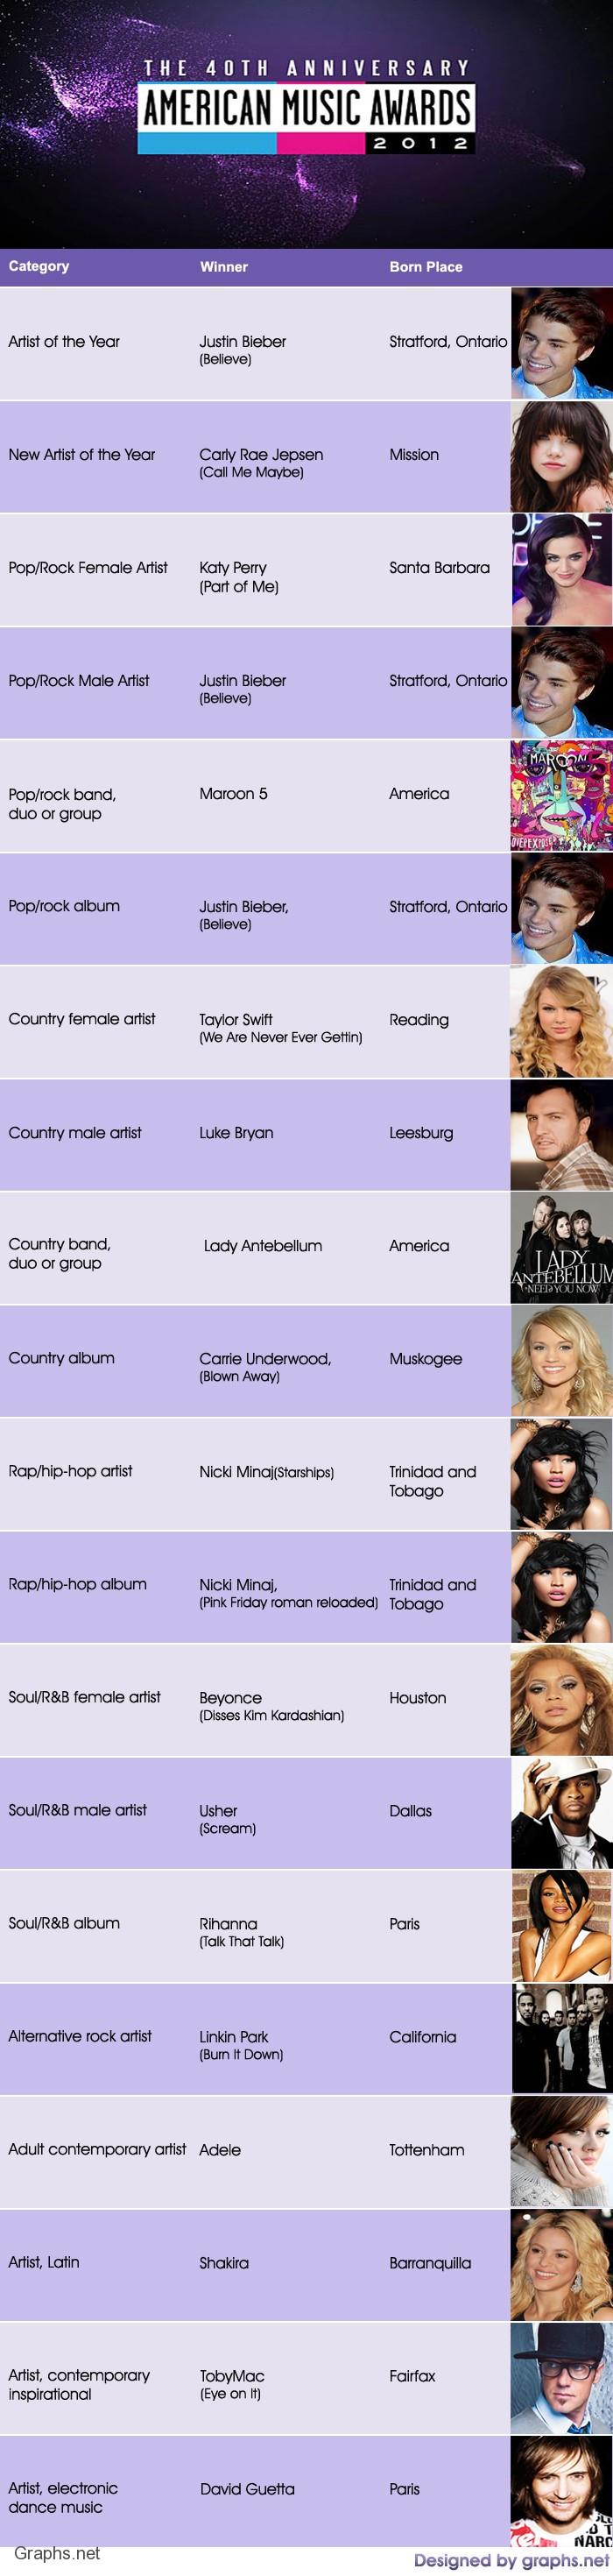 American Music Awards and Winners